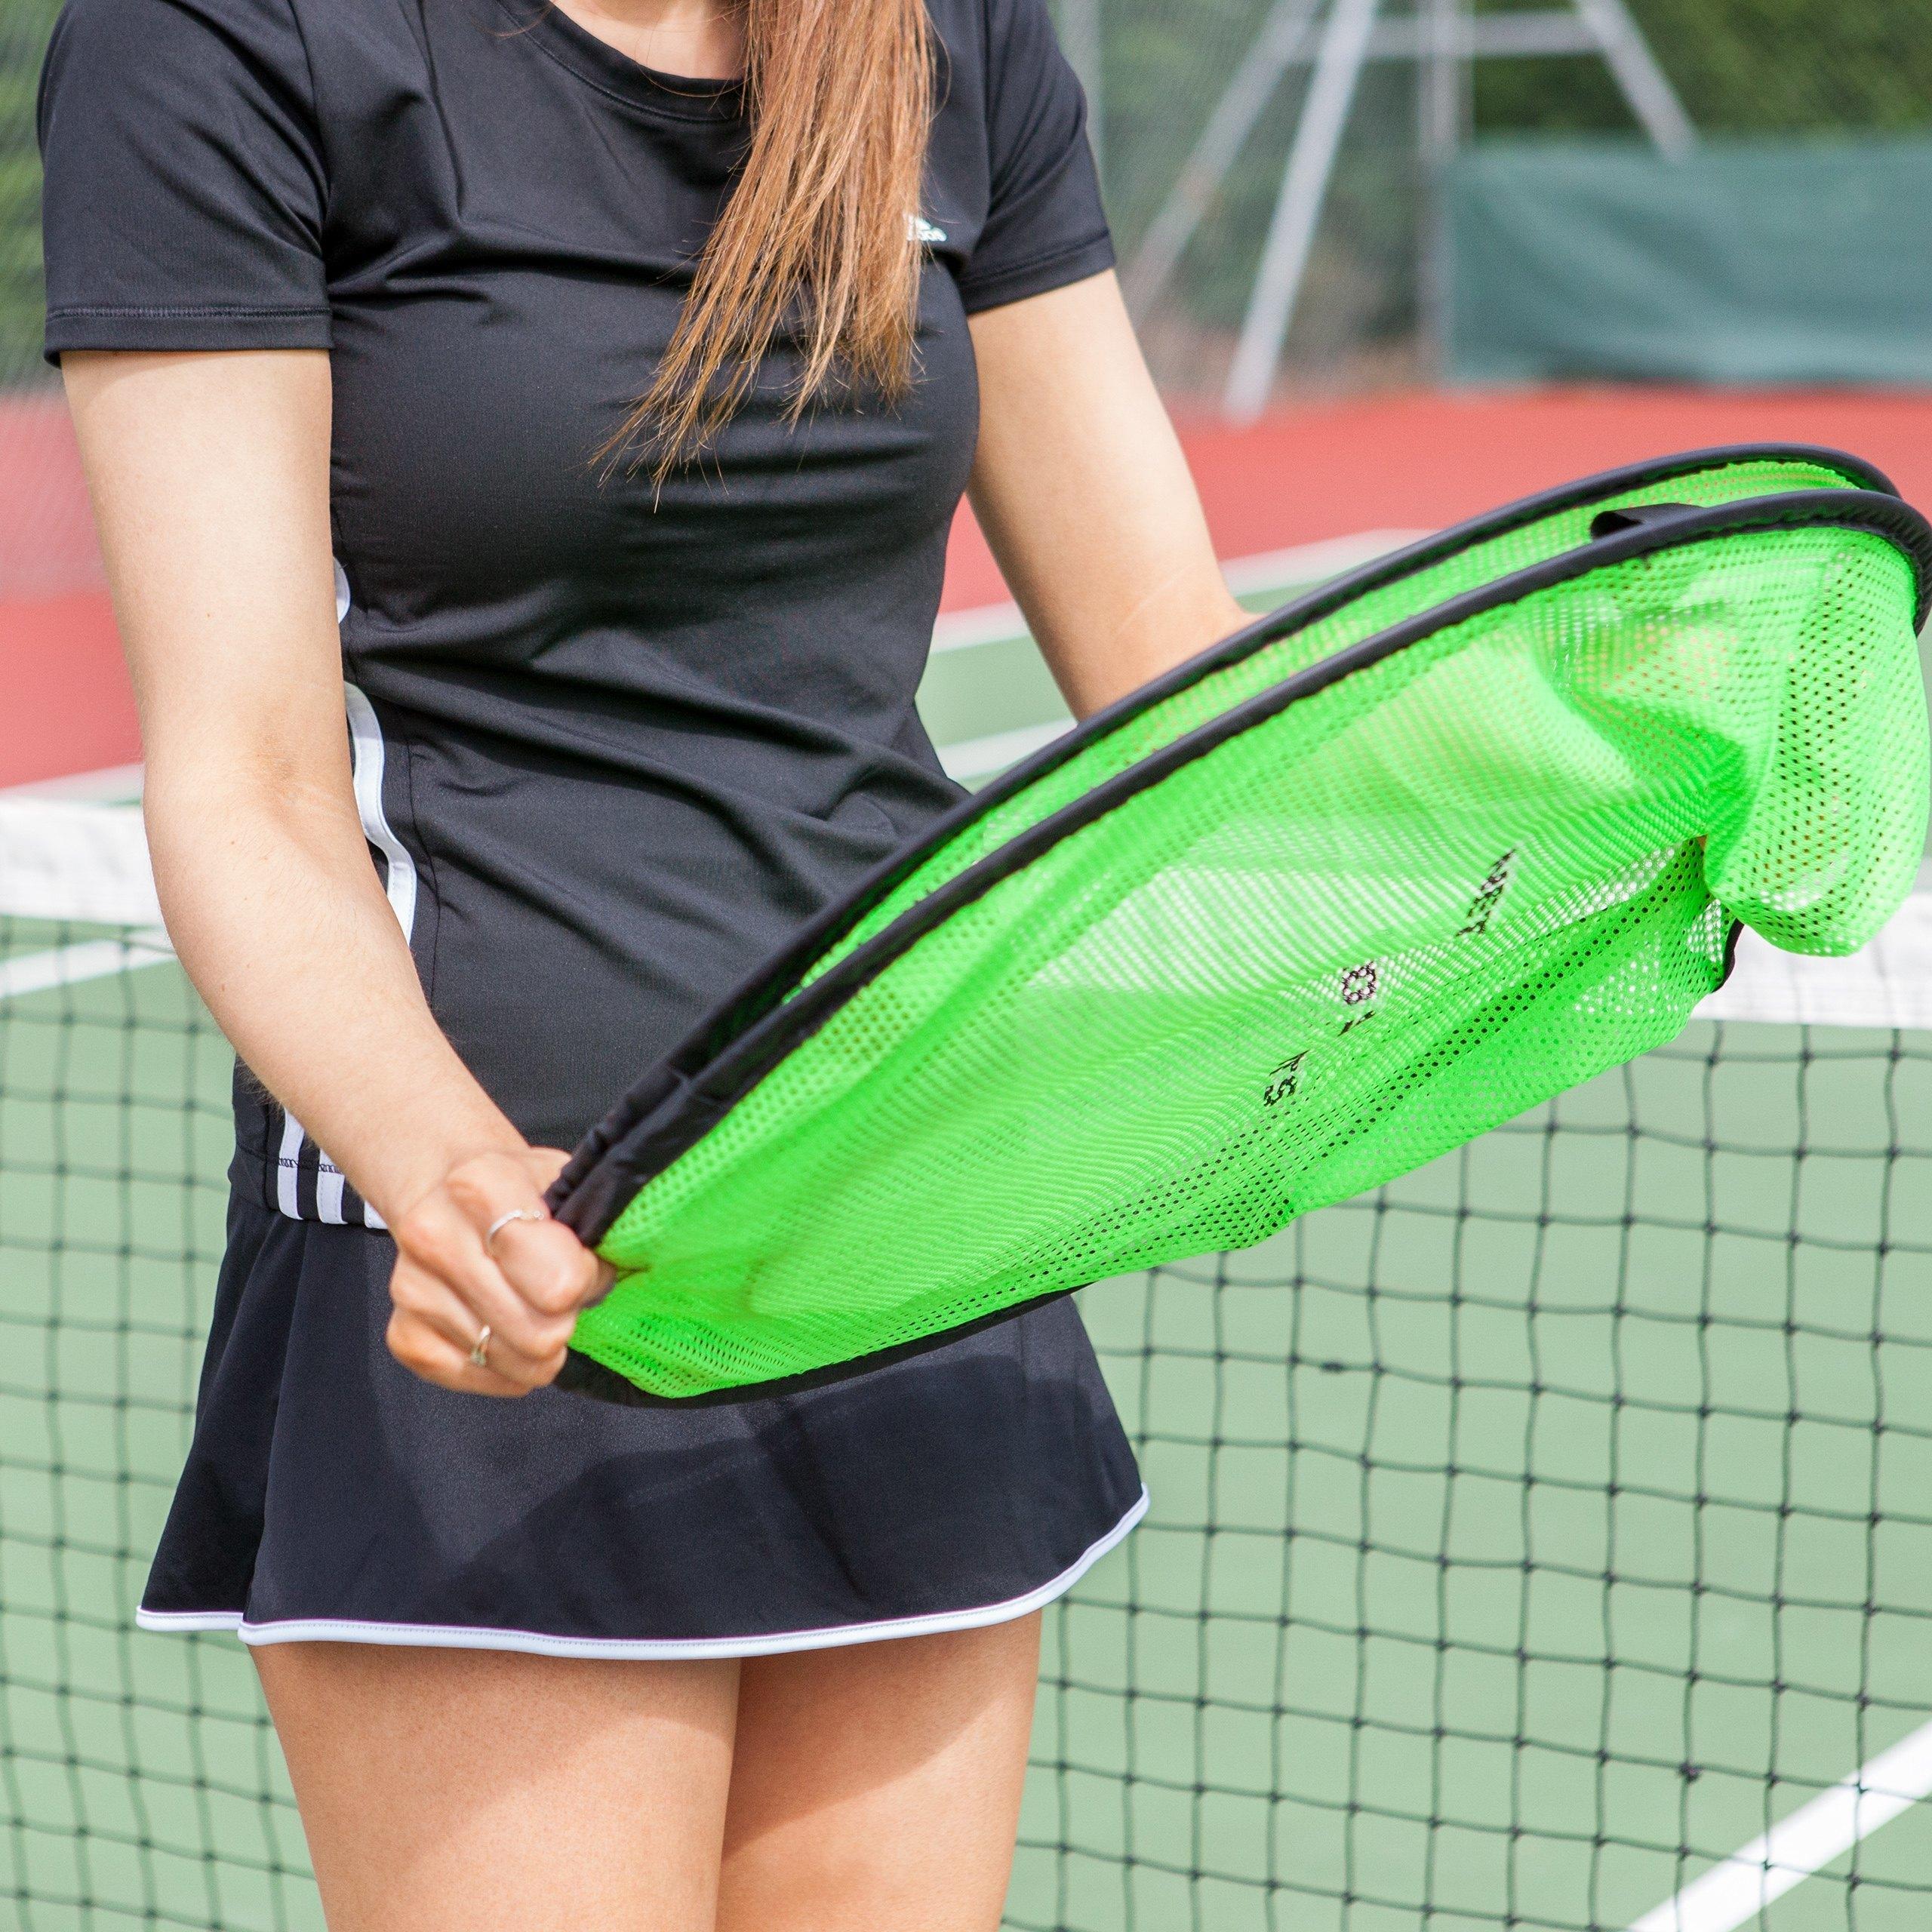 Easy Fold Tennis Net Targets